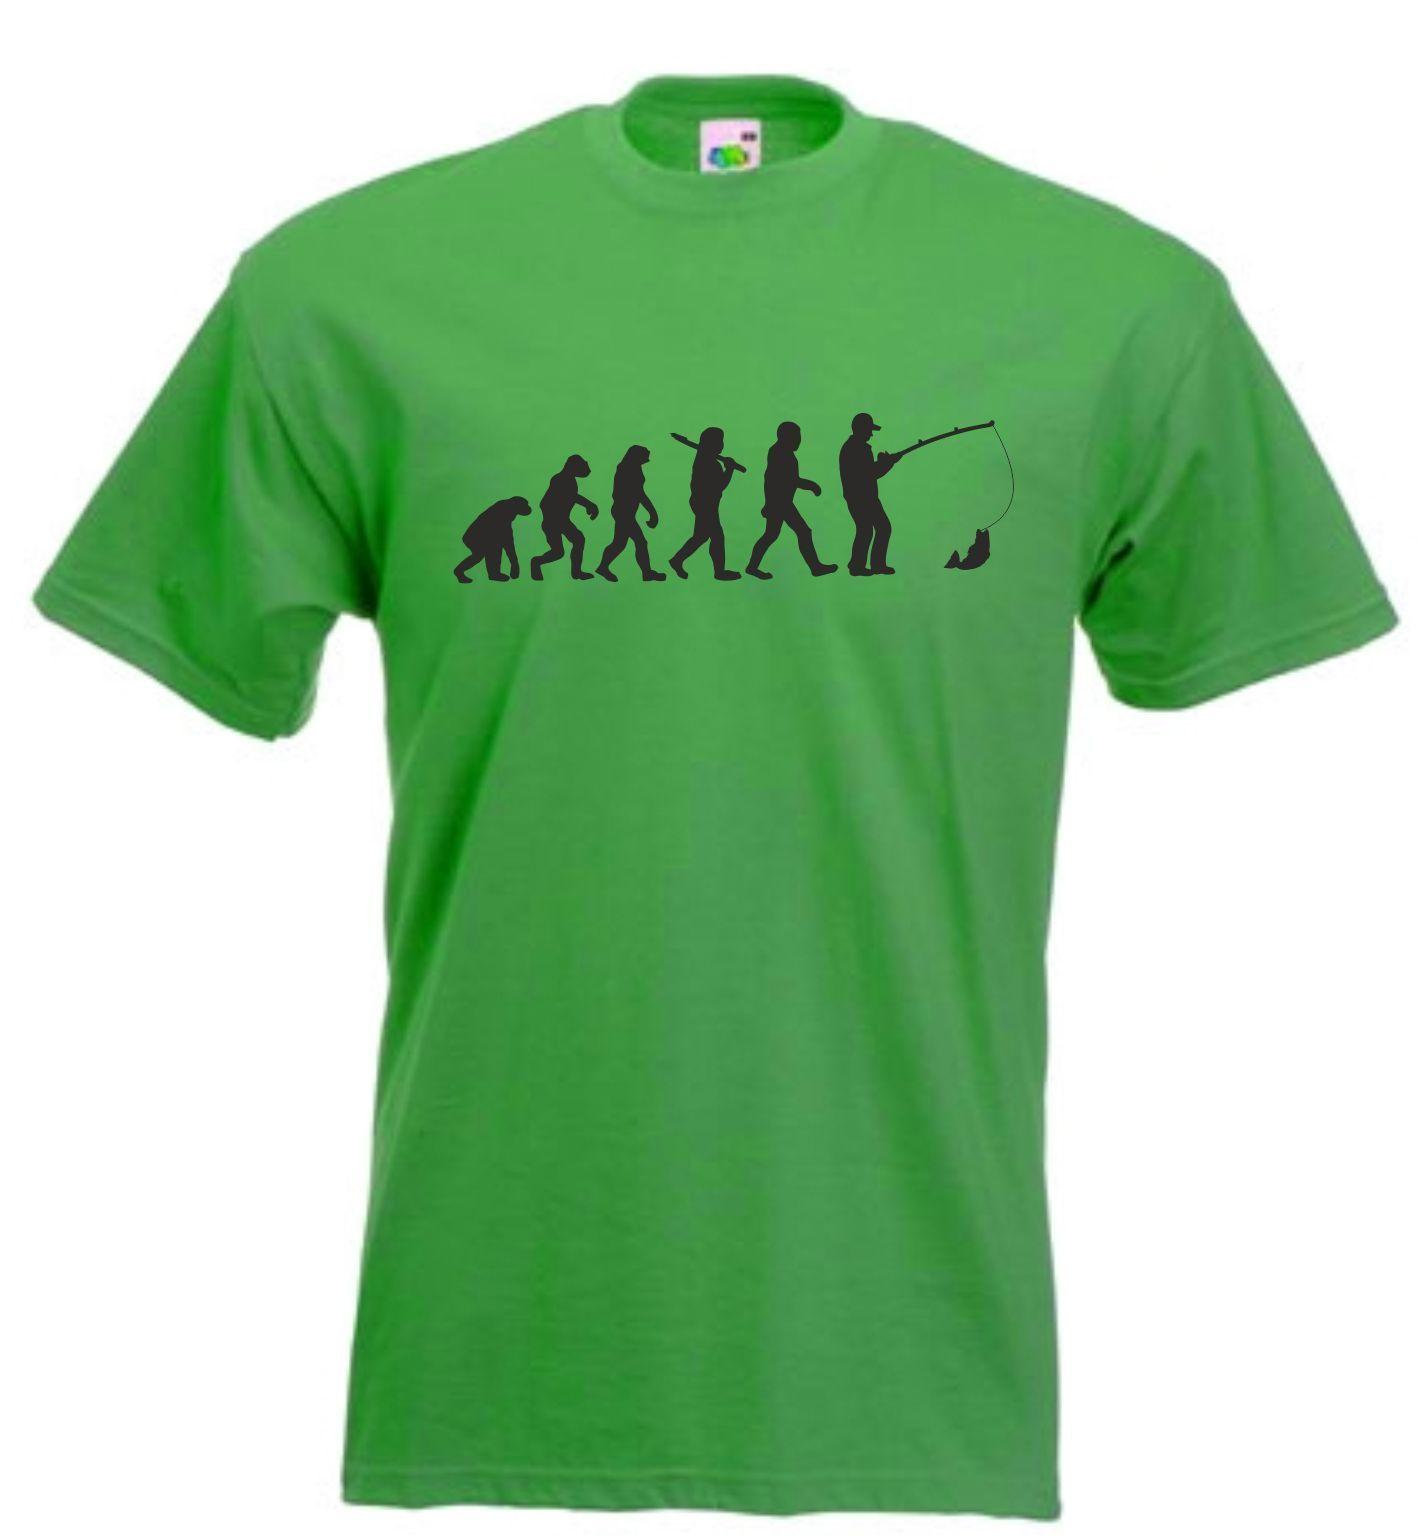 b0d4148cd839 EVOLUTION OF FISHING T SHIRT FISHERMAN TSHIRT ANGLING CARP T SHIRT SIZES S  XXL Funny Tshirt And Shirt Shirts Cool From Young ten